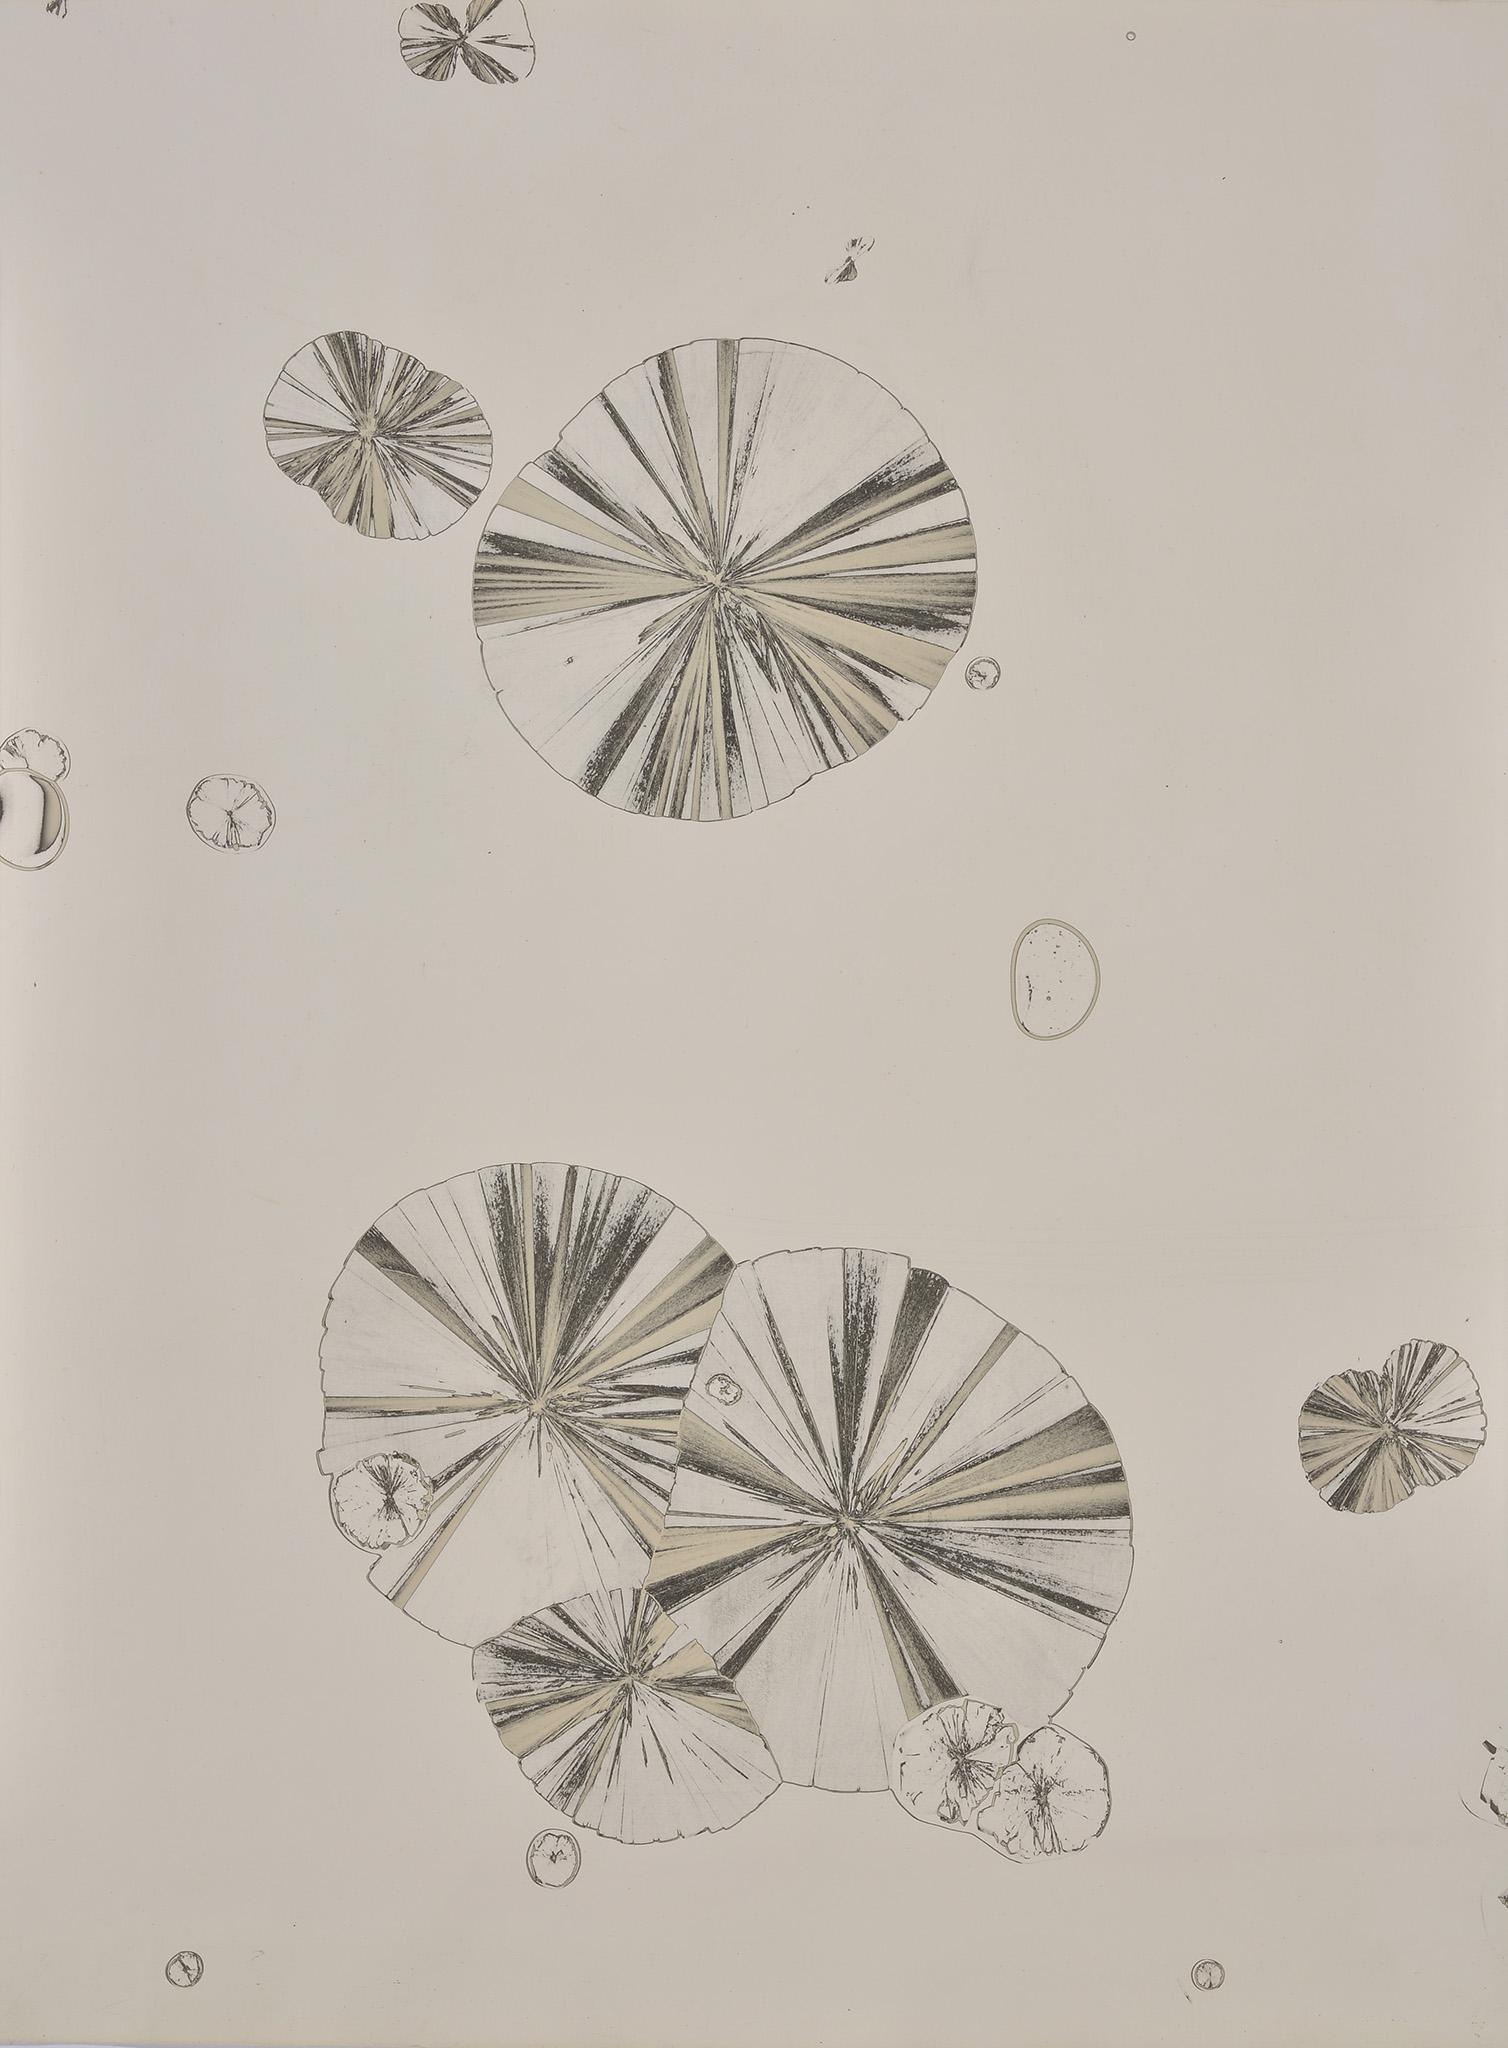 Matériographie, c. 1965-1970